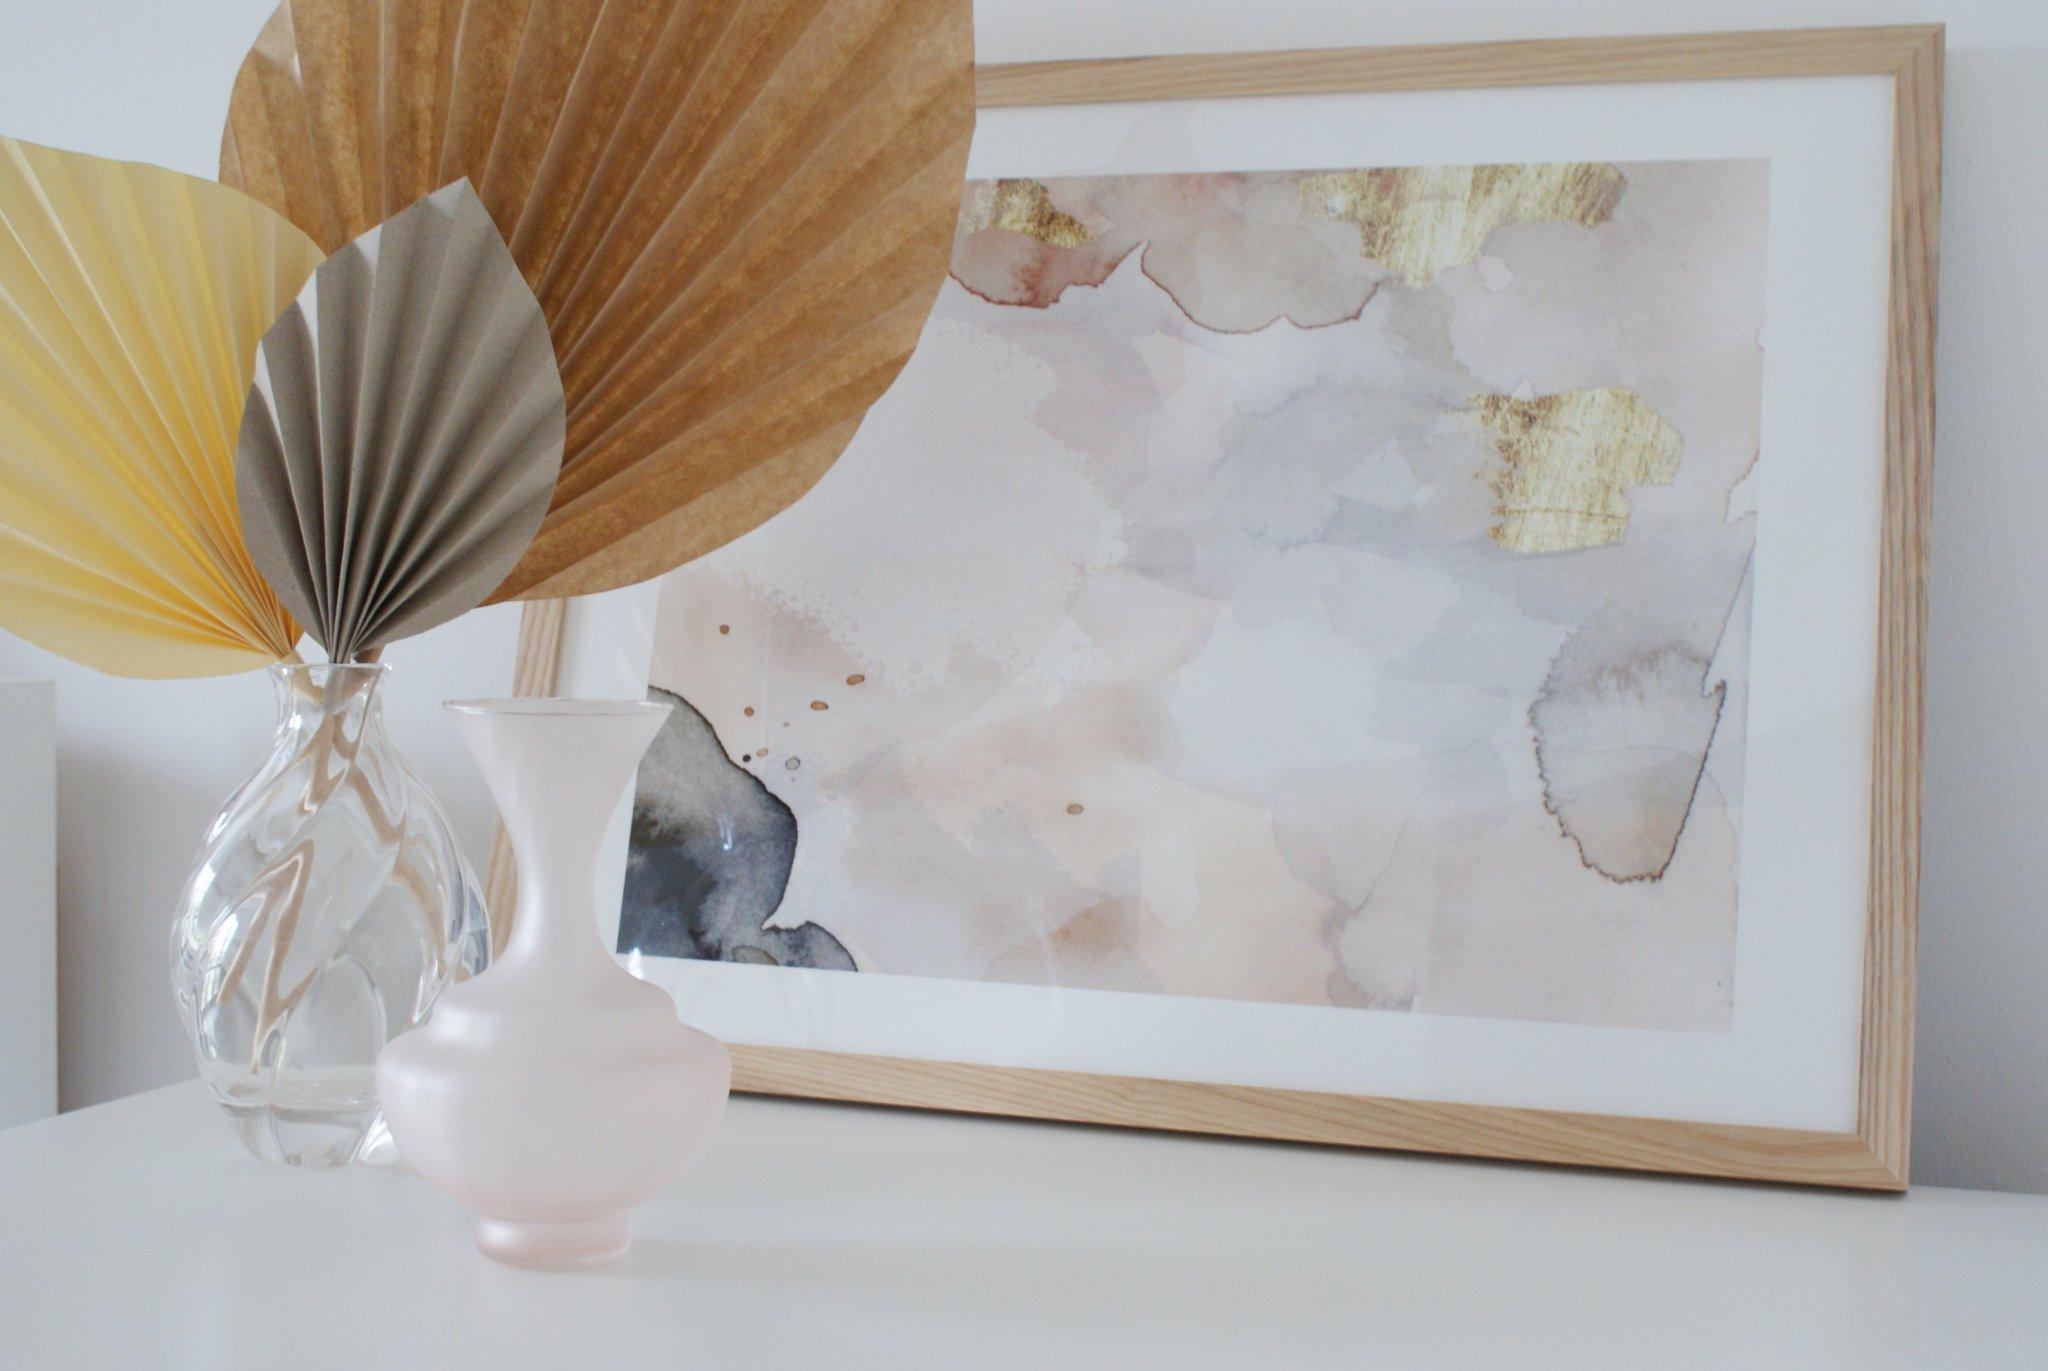 diy palm paper leaf leaves decor idea handmade craft easy simple tutorial home decoration neutral minimalist francinesplaceblog 4